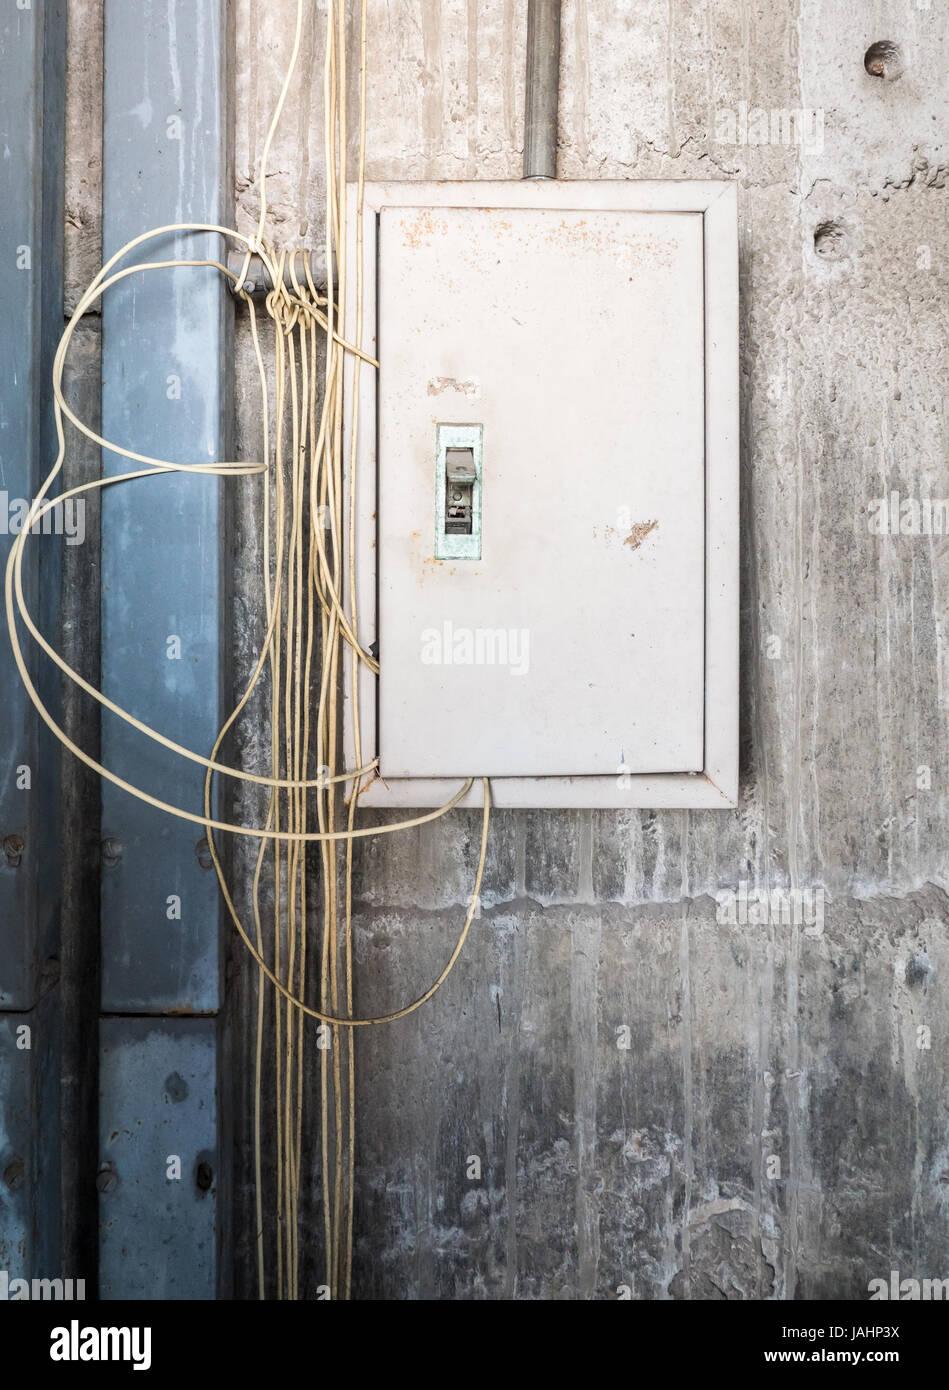 hight resolution of fuse box lock wiring diagram mega home fuse box lock